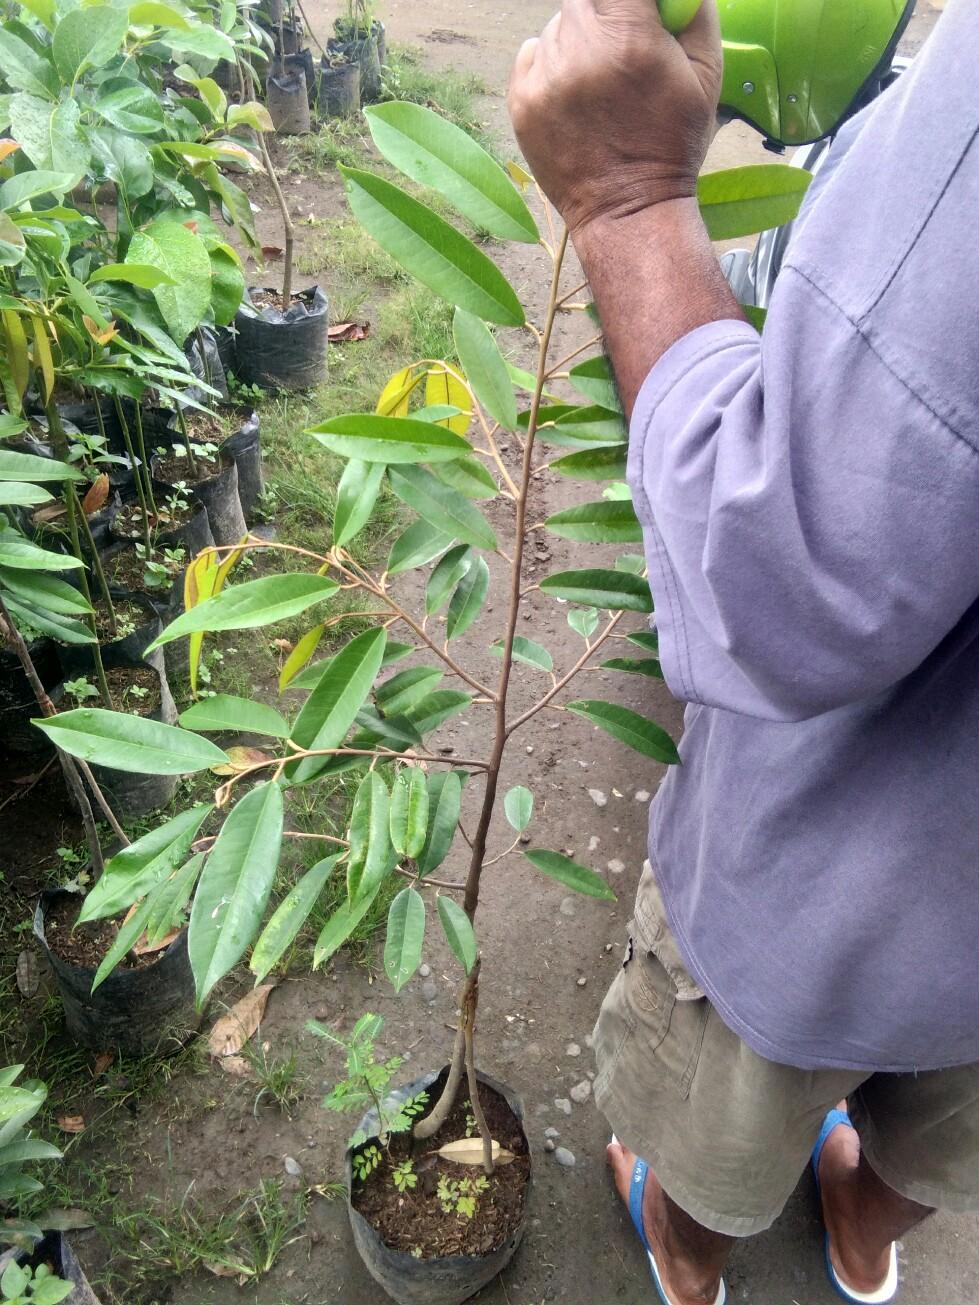 tanaman buah durian musang king kaki 2